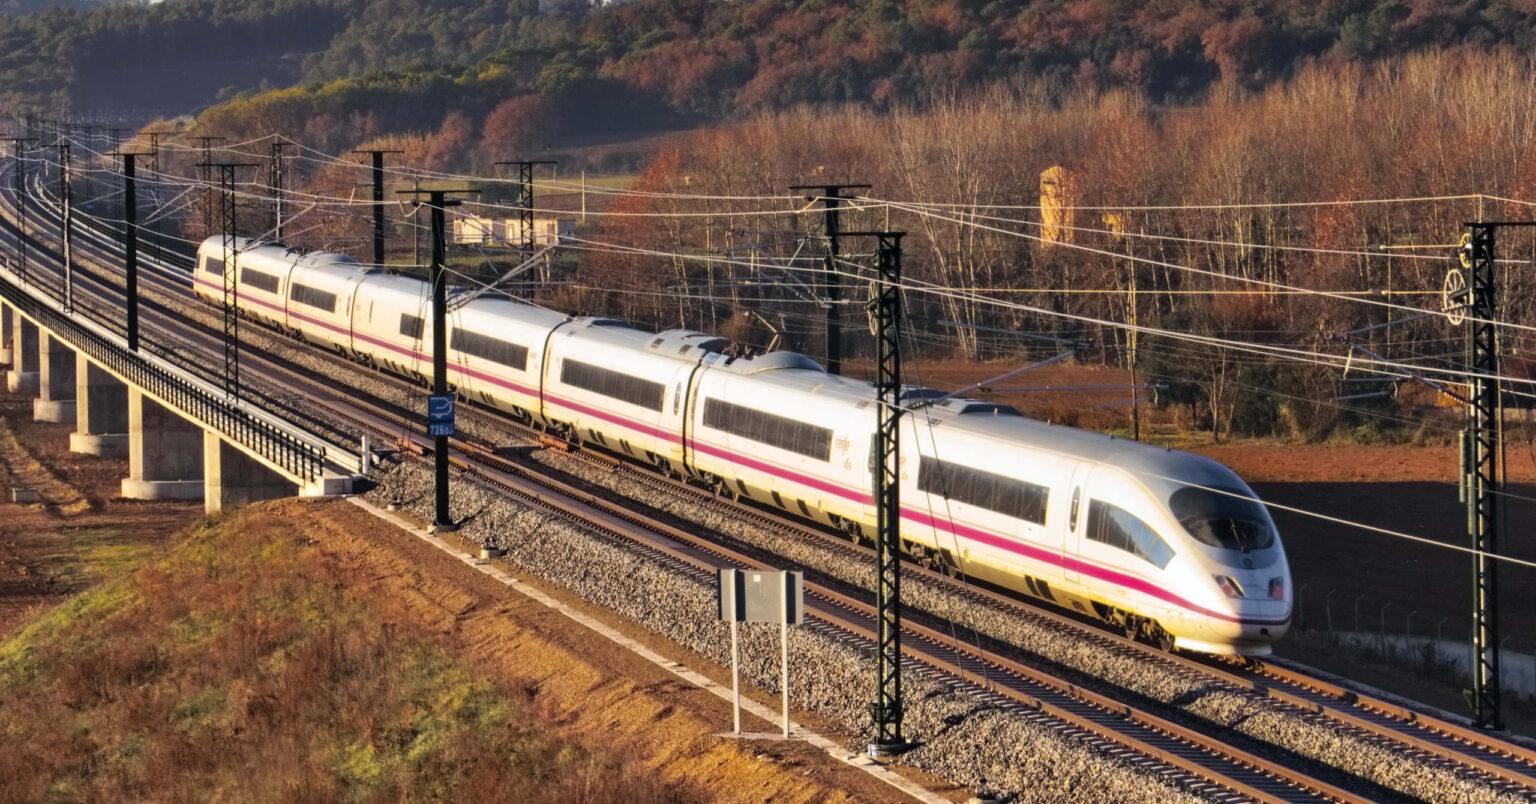 Tren de la serie 103 de Renfe AVE camino de Barcelona. JORDI VERDUGO.